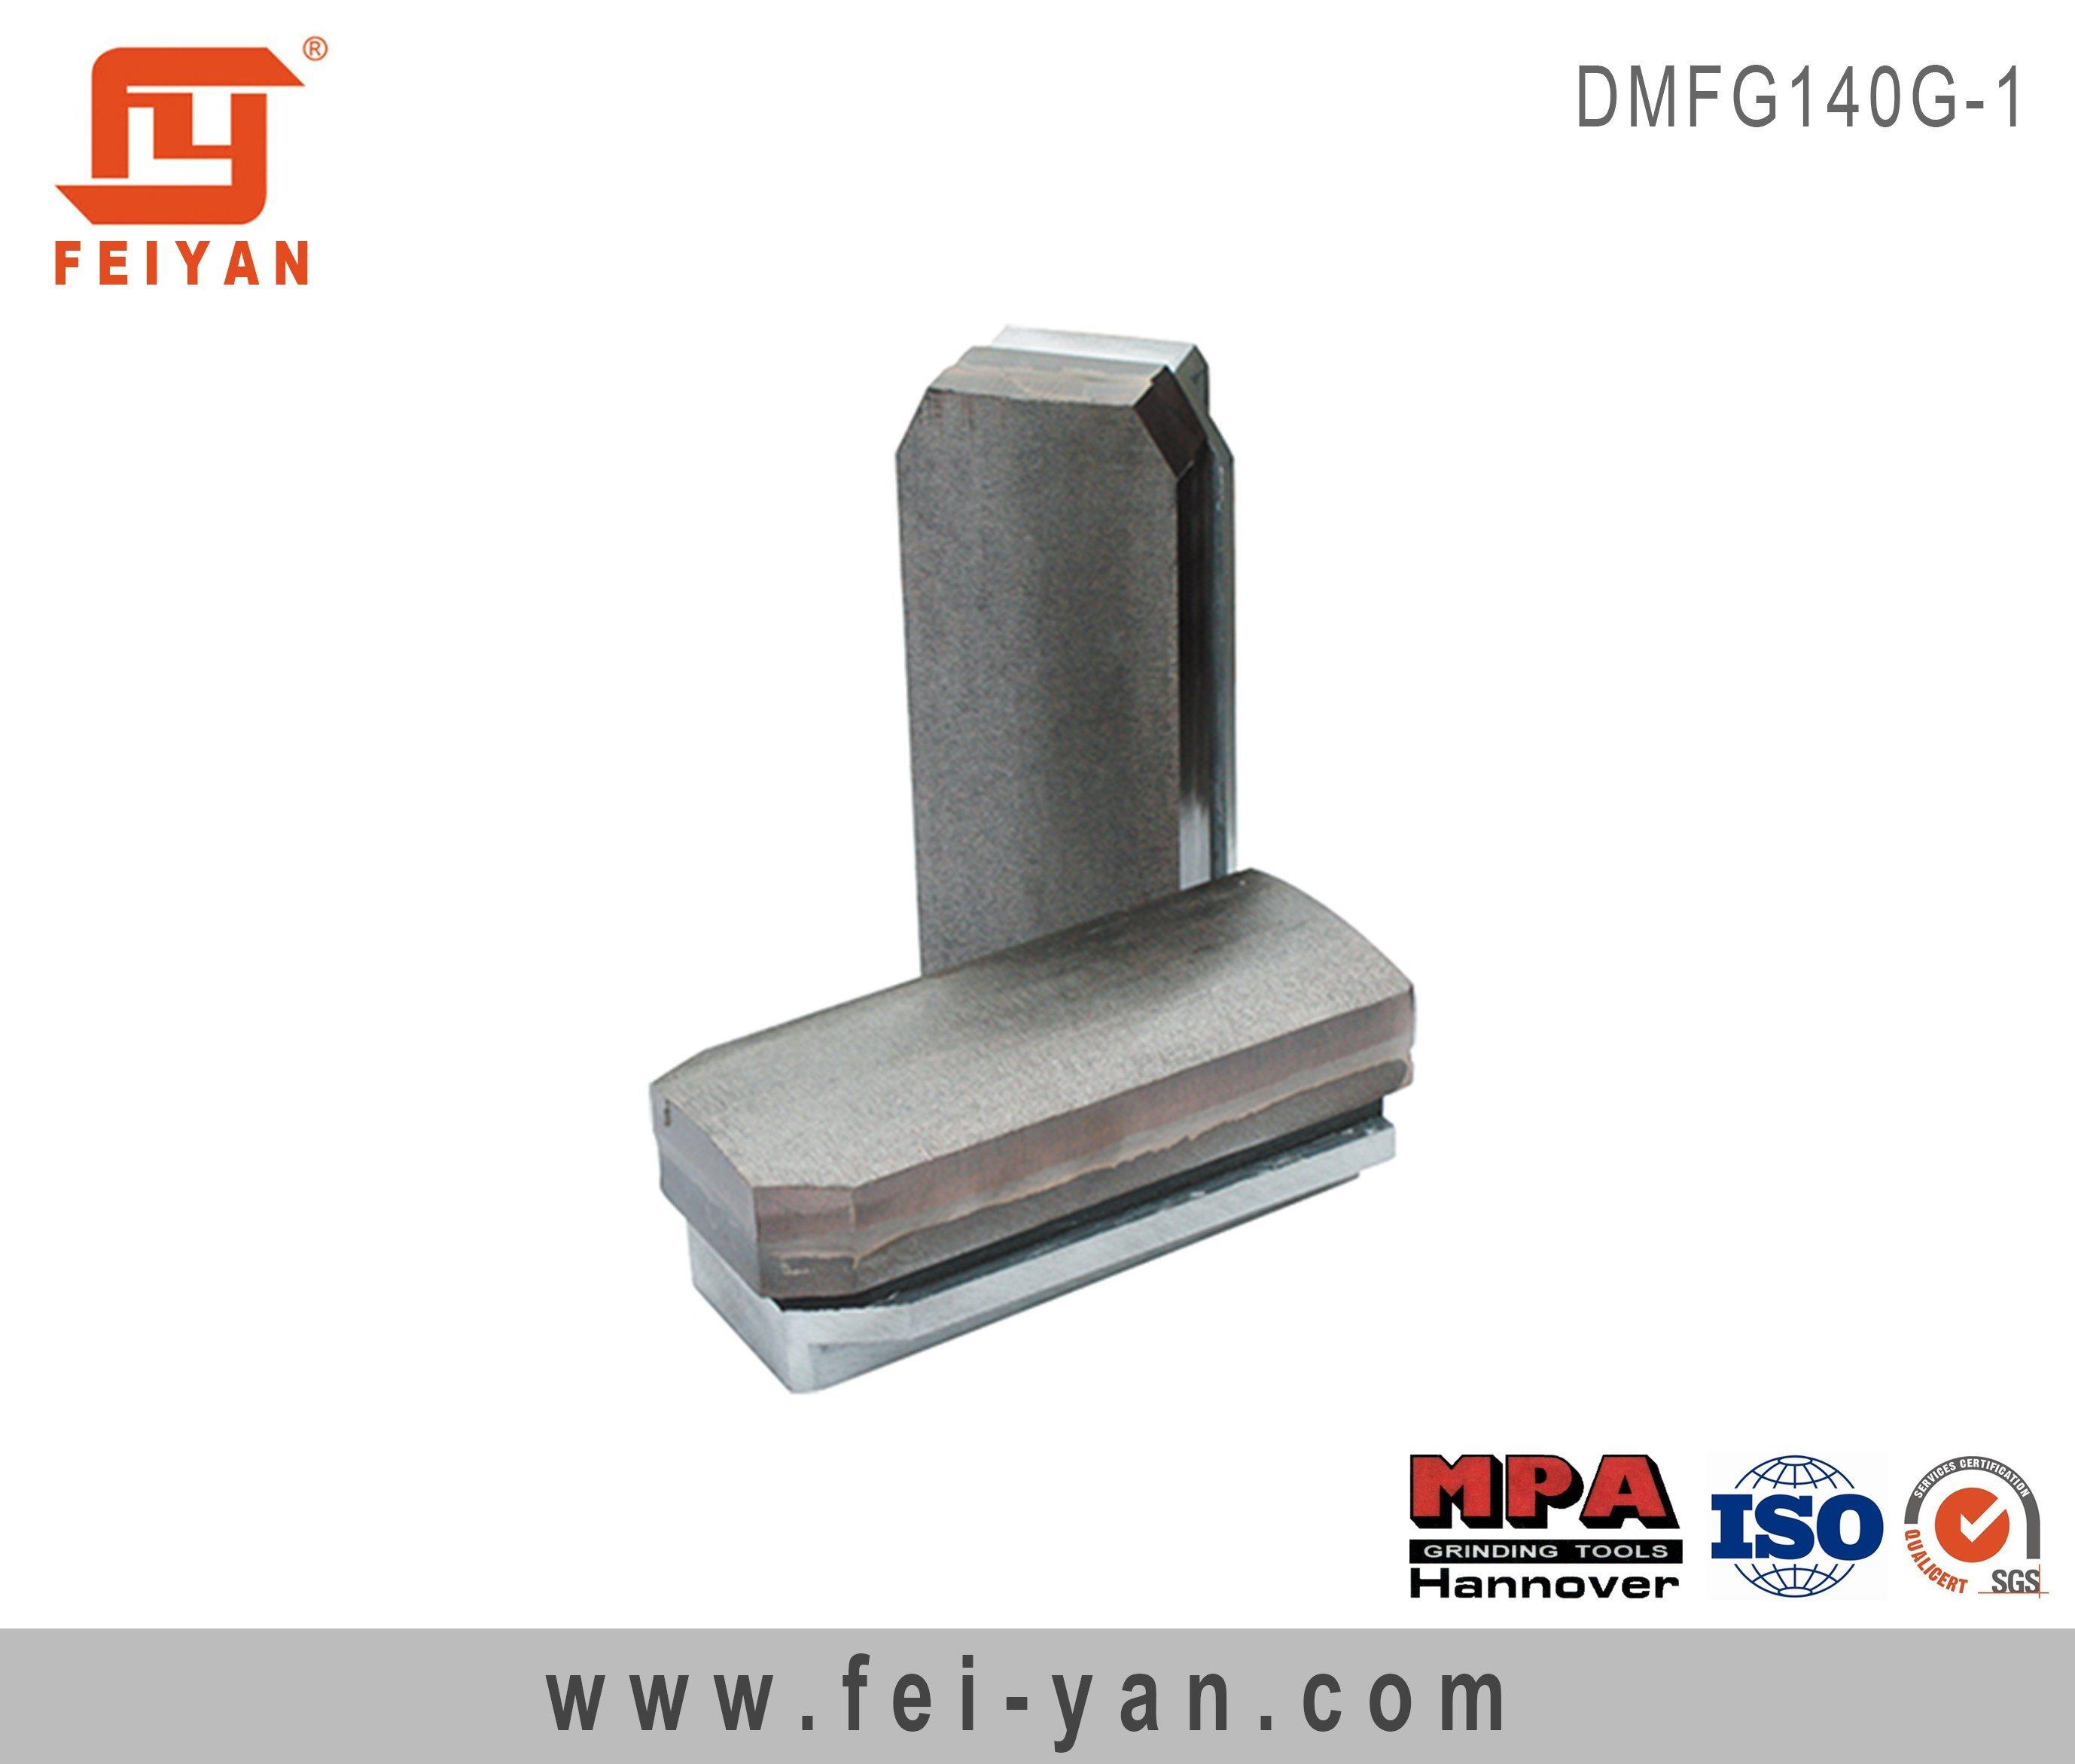 Metal Fickert for Semi-Automatic Polishing Machine